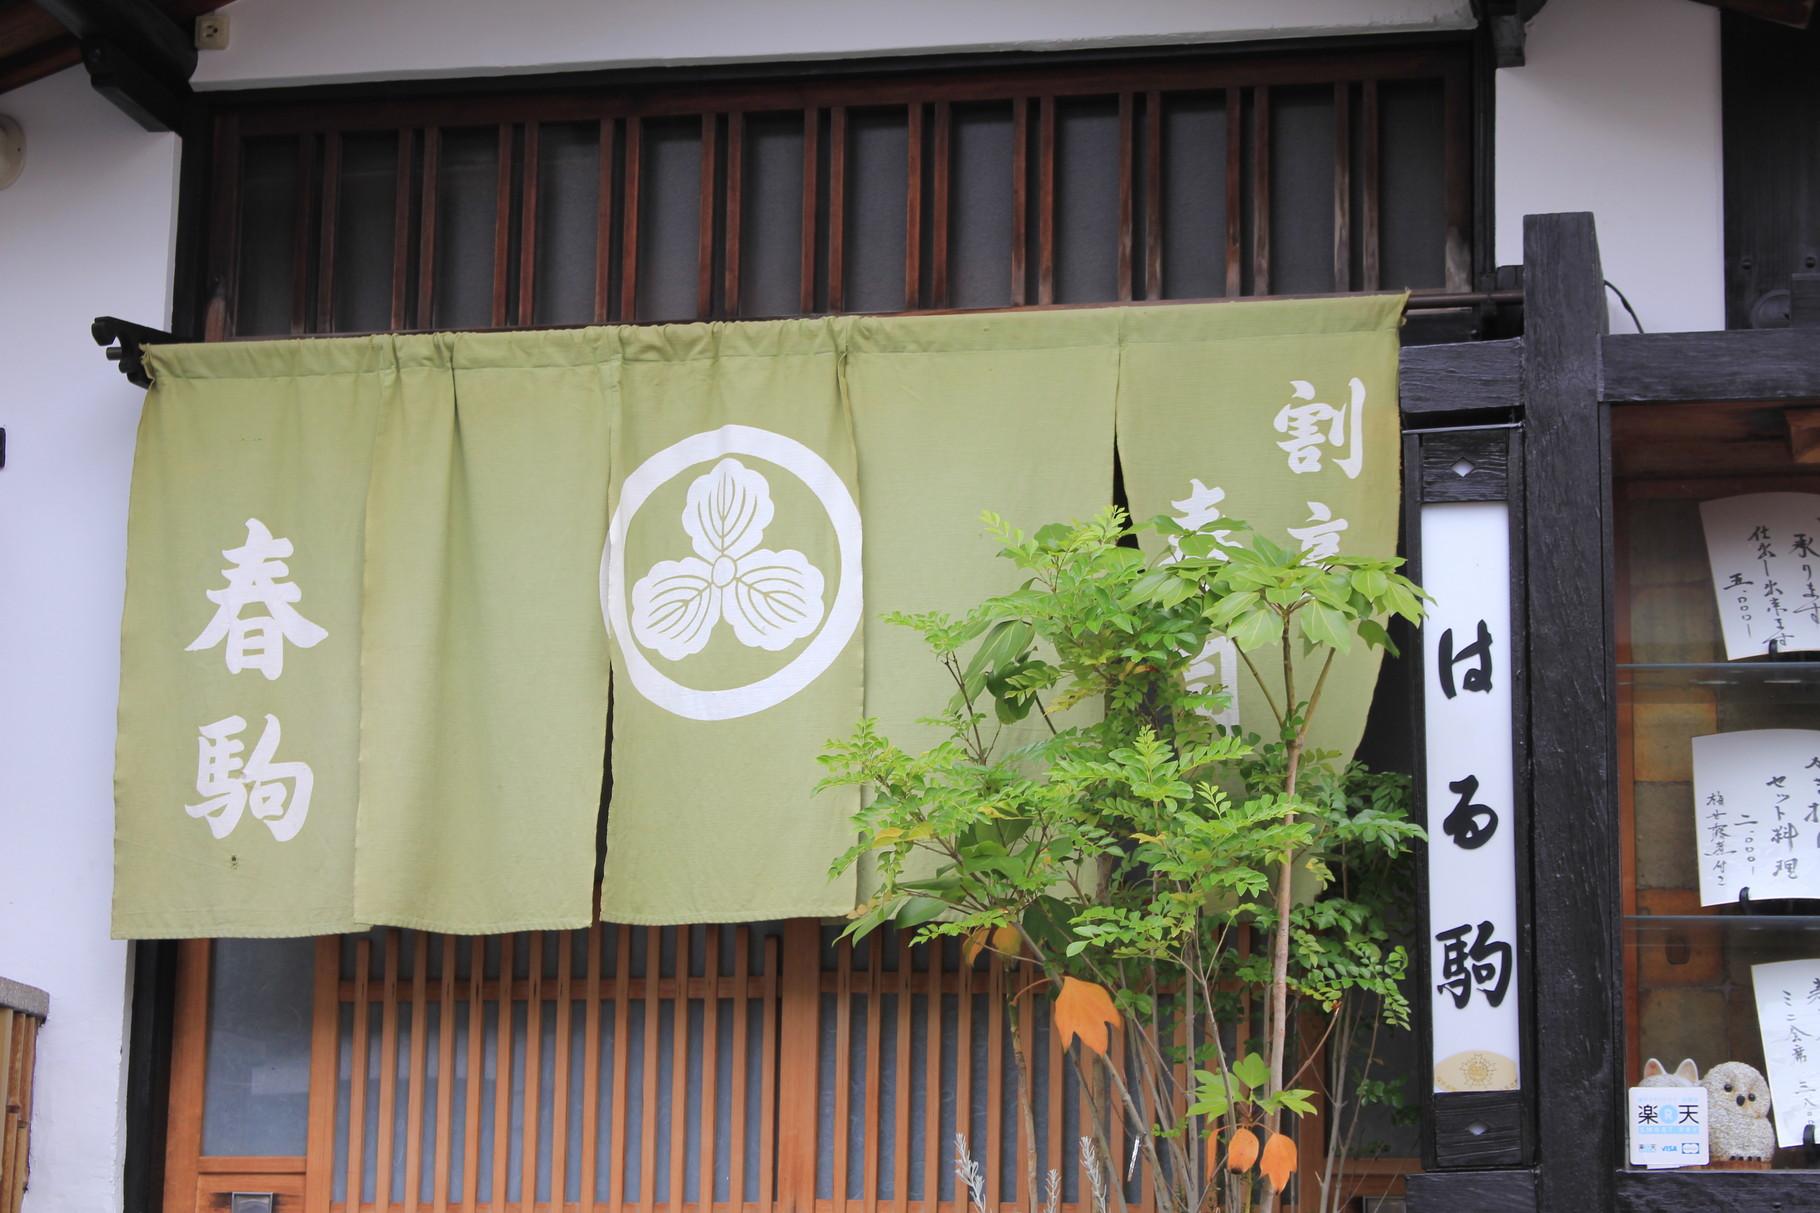 春駒 - 春駒 壽司割烹 敦賀港から車で5分【福井県敦賀市】